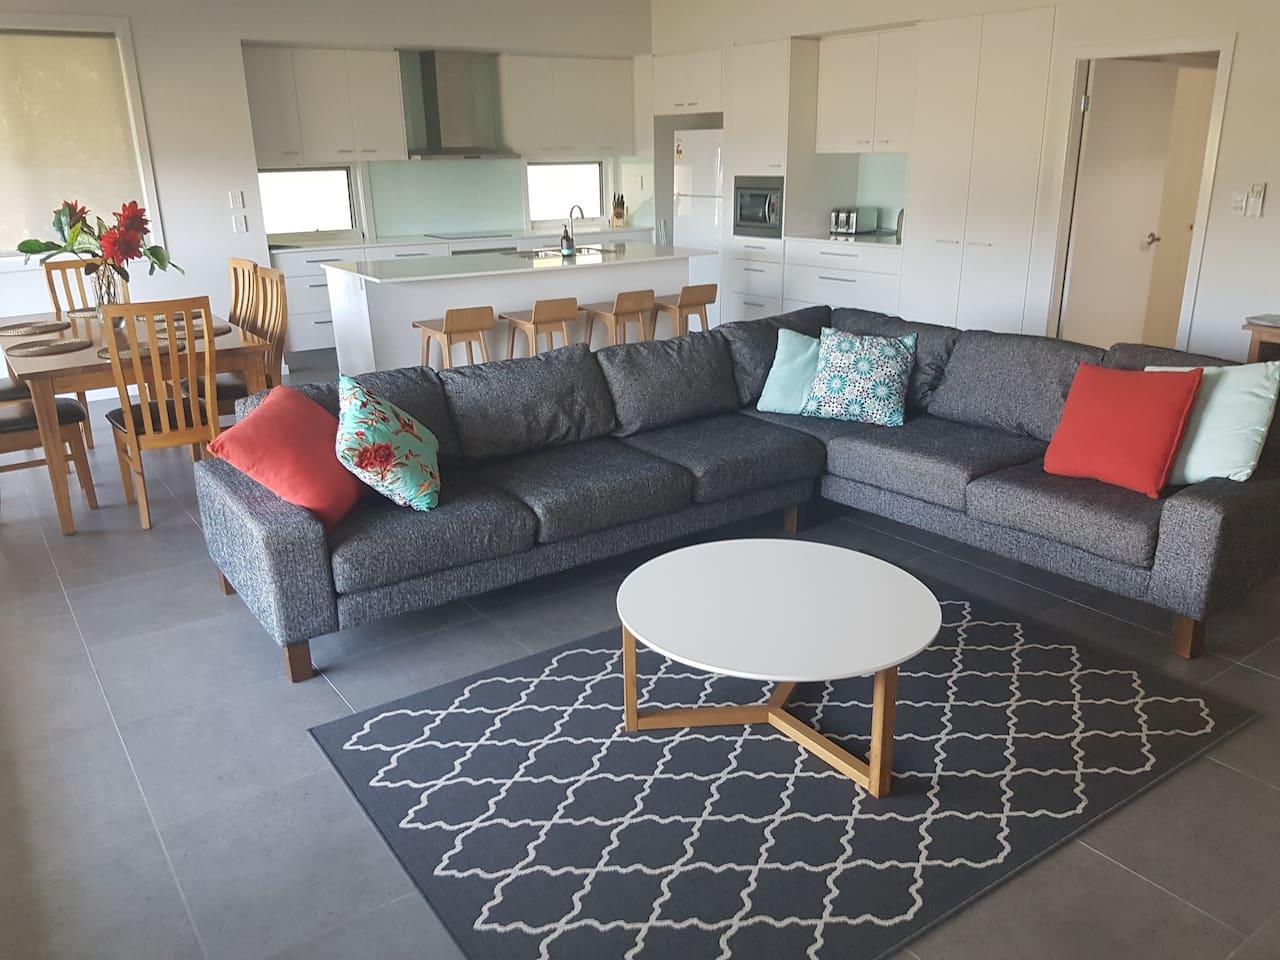 Spacious open plan Interior - Lounge, Kitchen & Dining